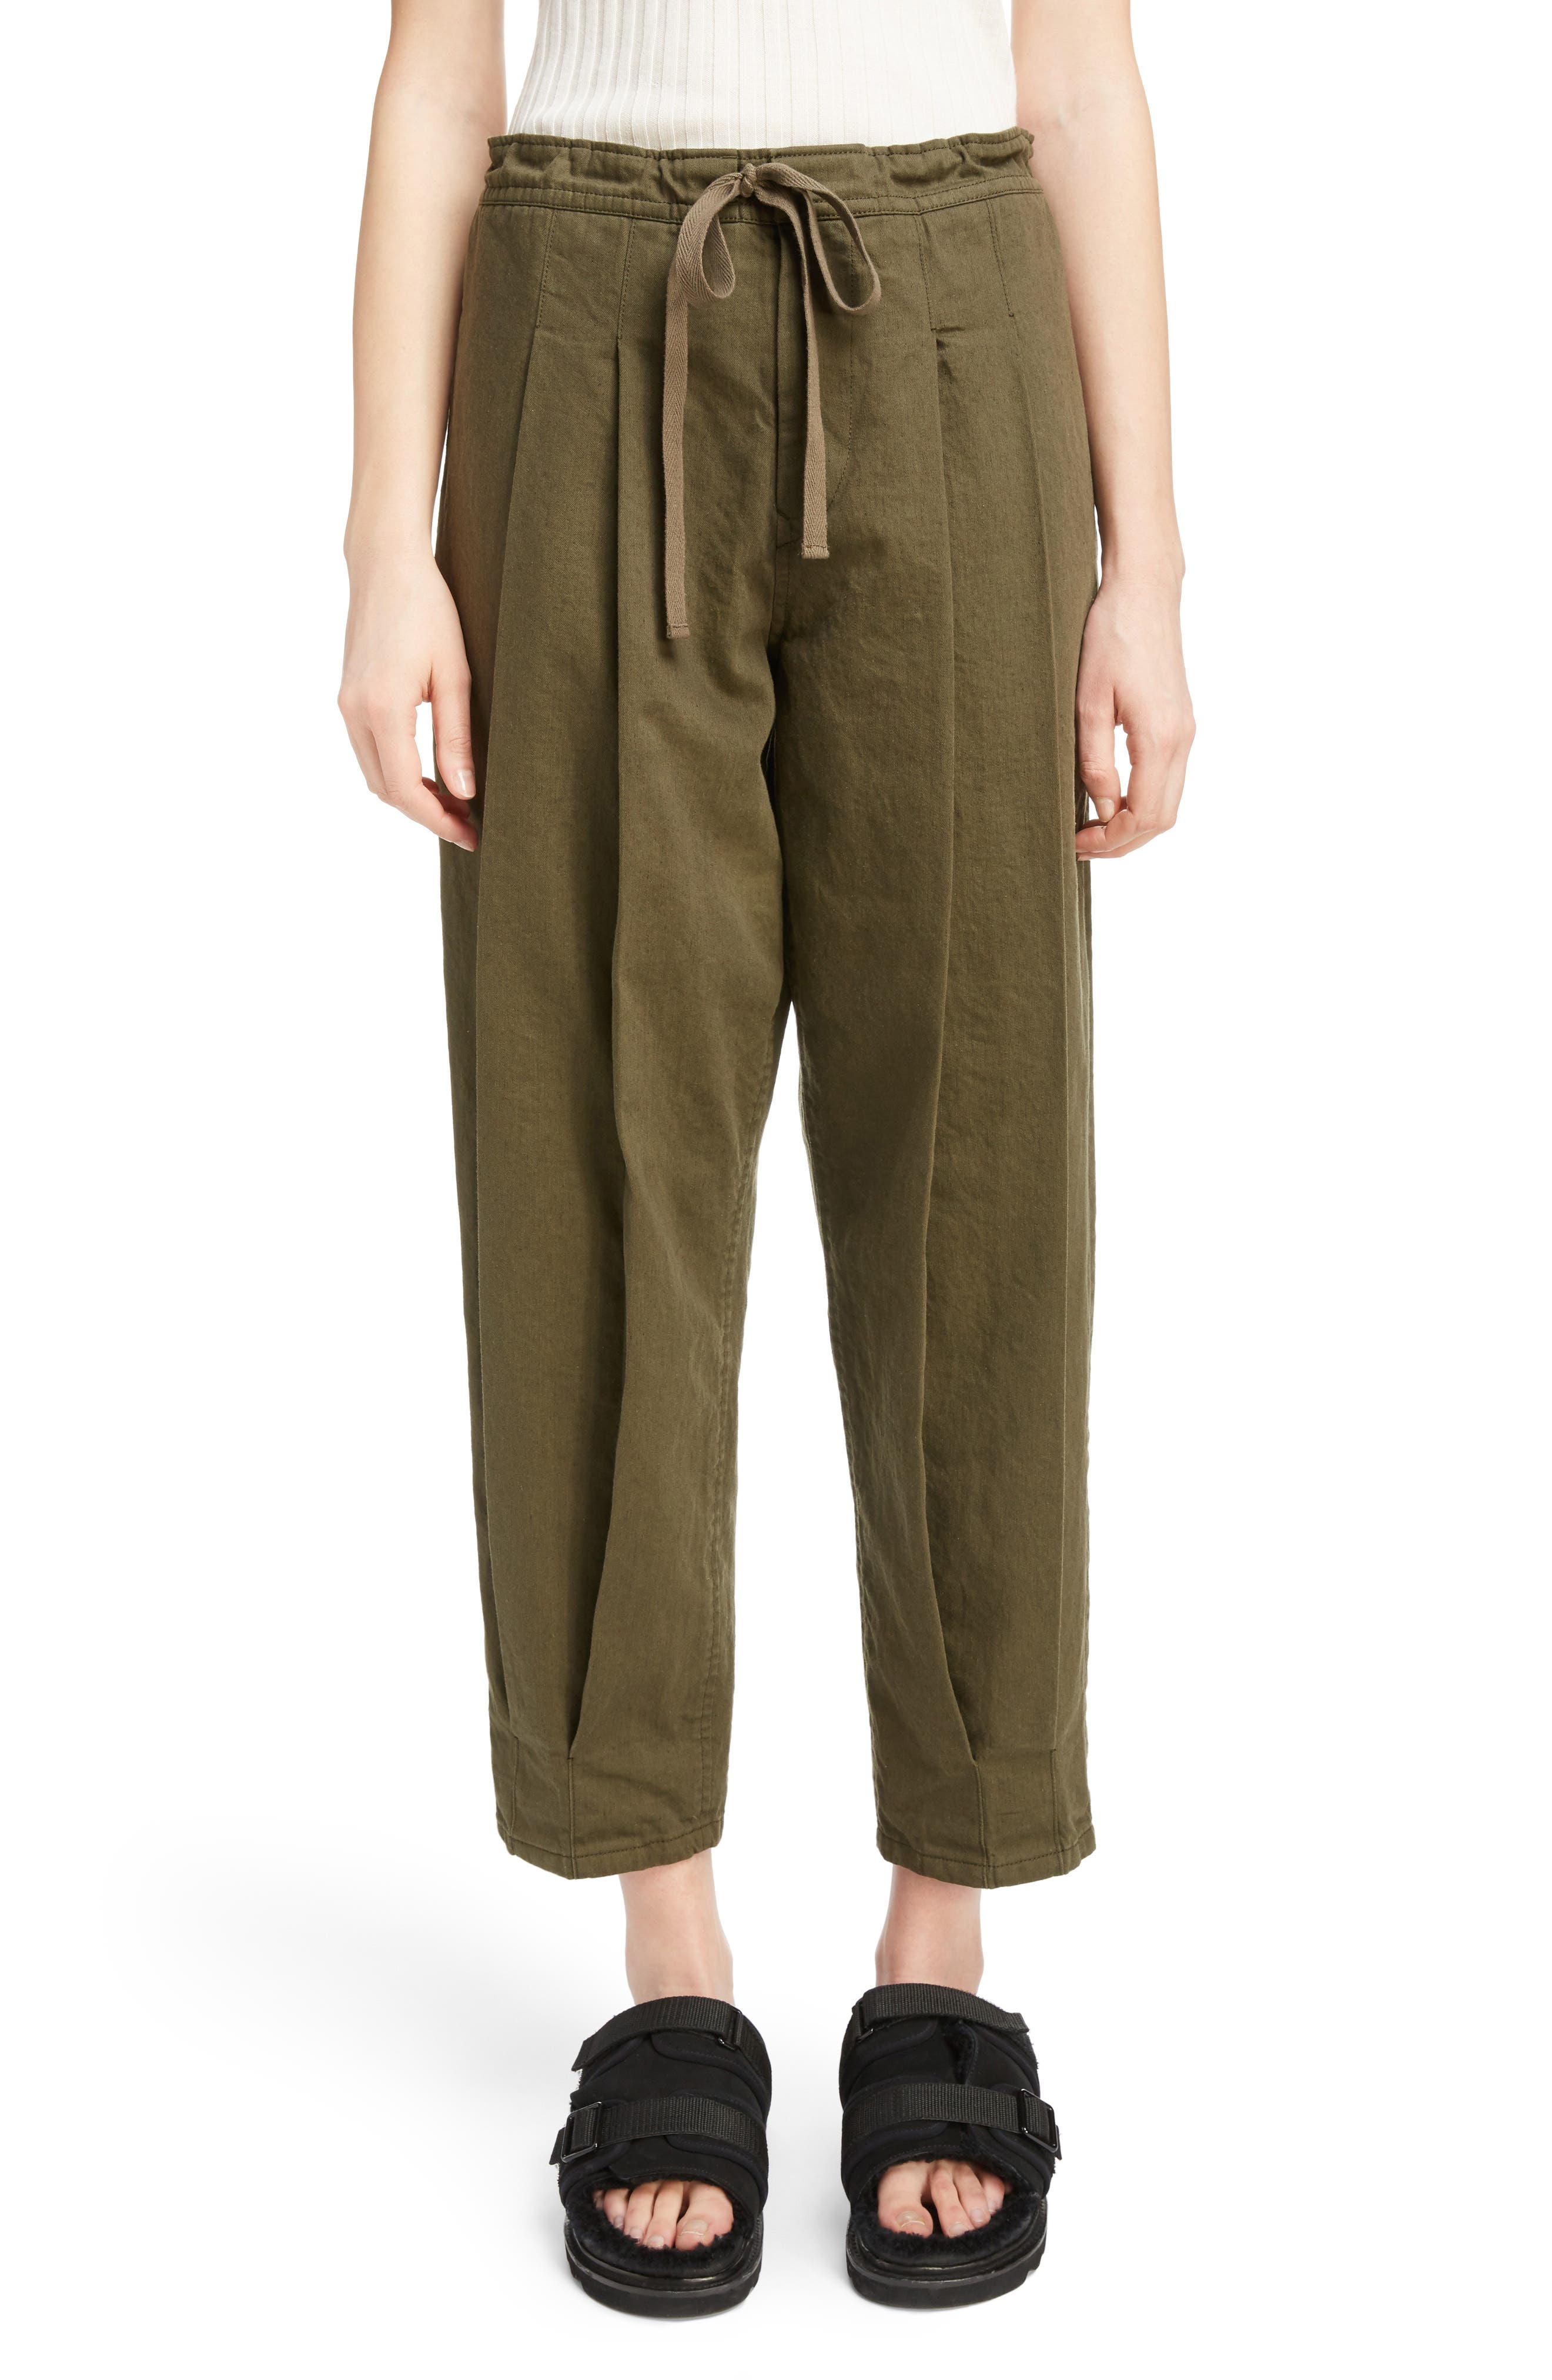 Y's by Yohji Yamamoto Dart Front Drawstring Pants